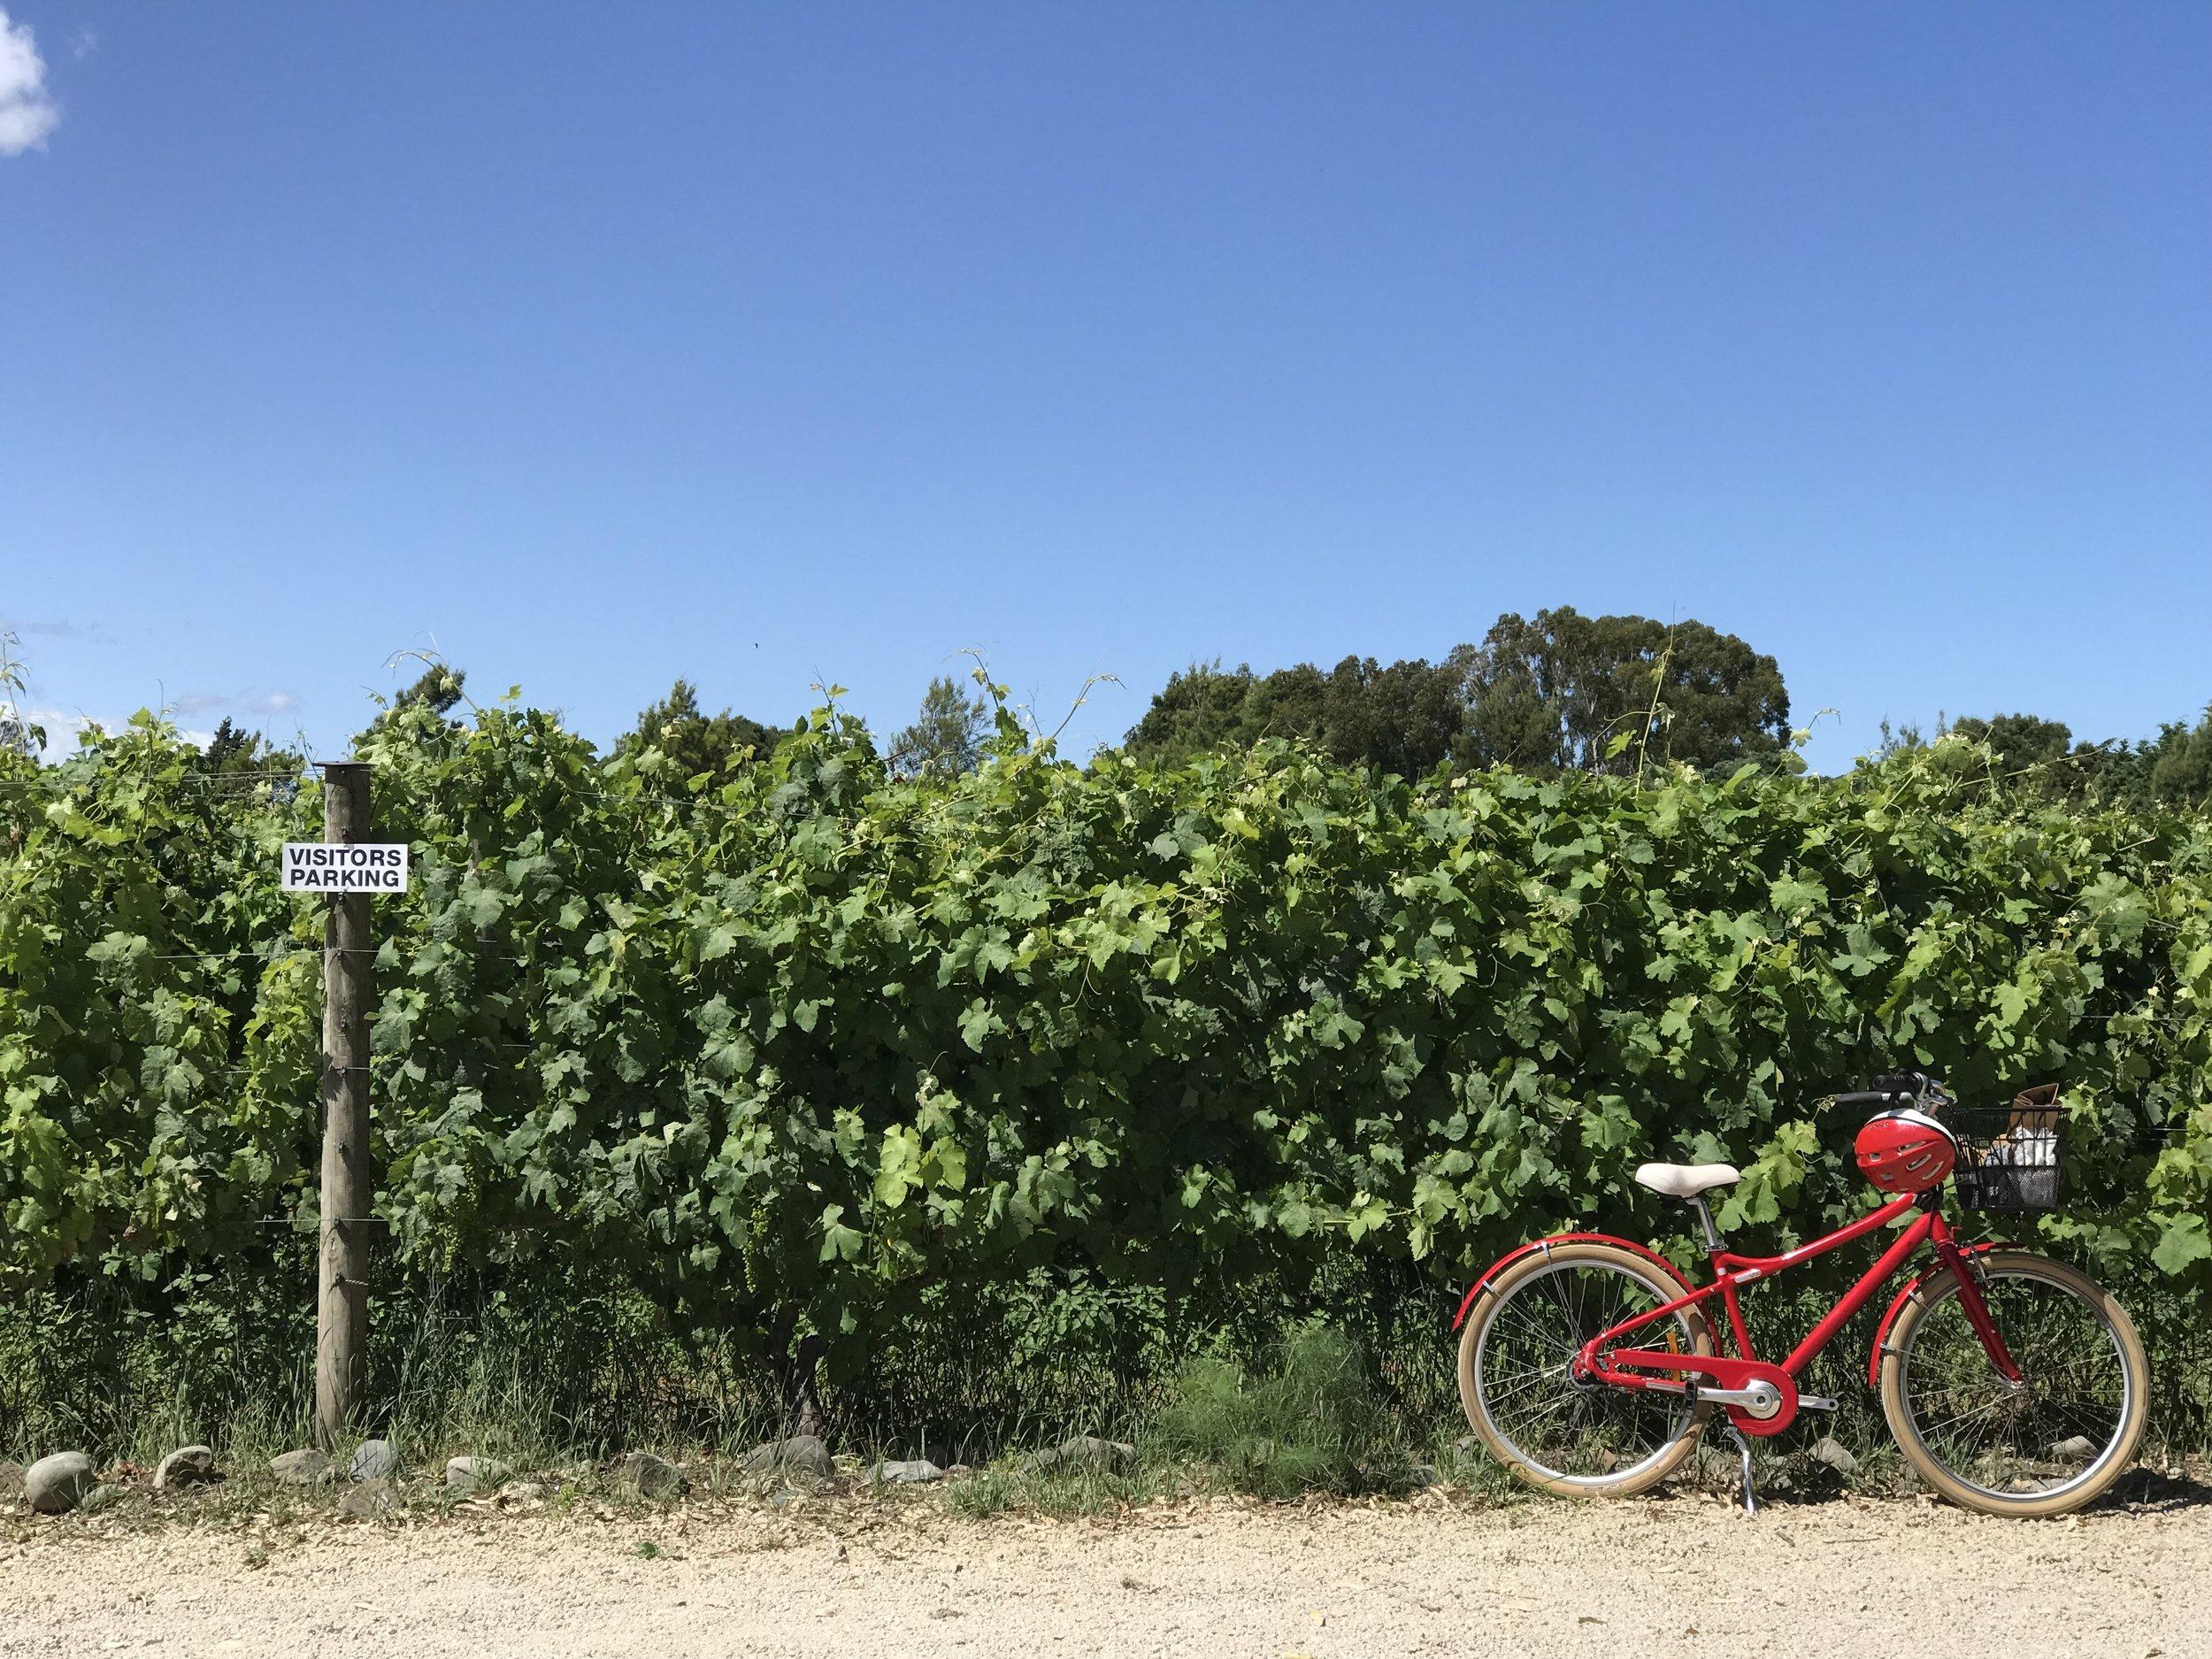 Cambridge Road vineyard, Martinborough, Wairarapa (image by Jacqui Gibson).